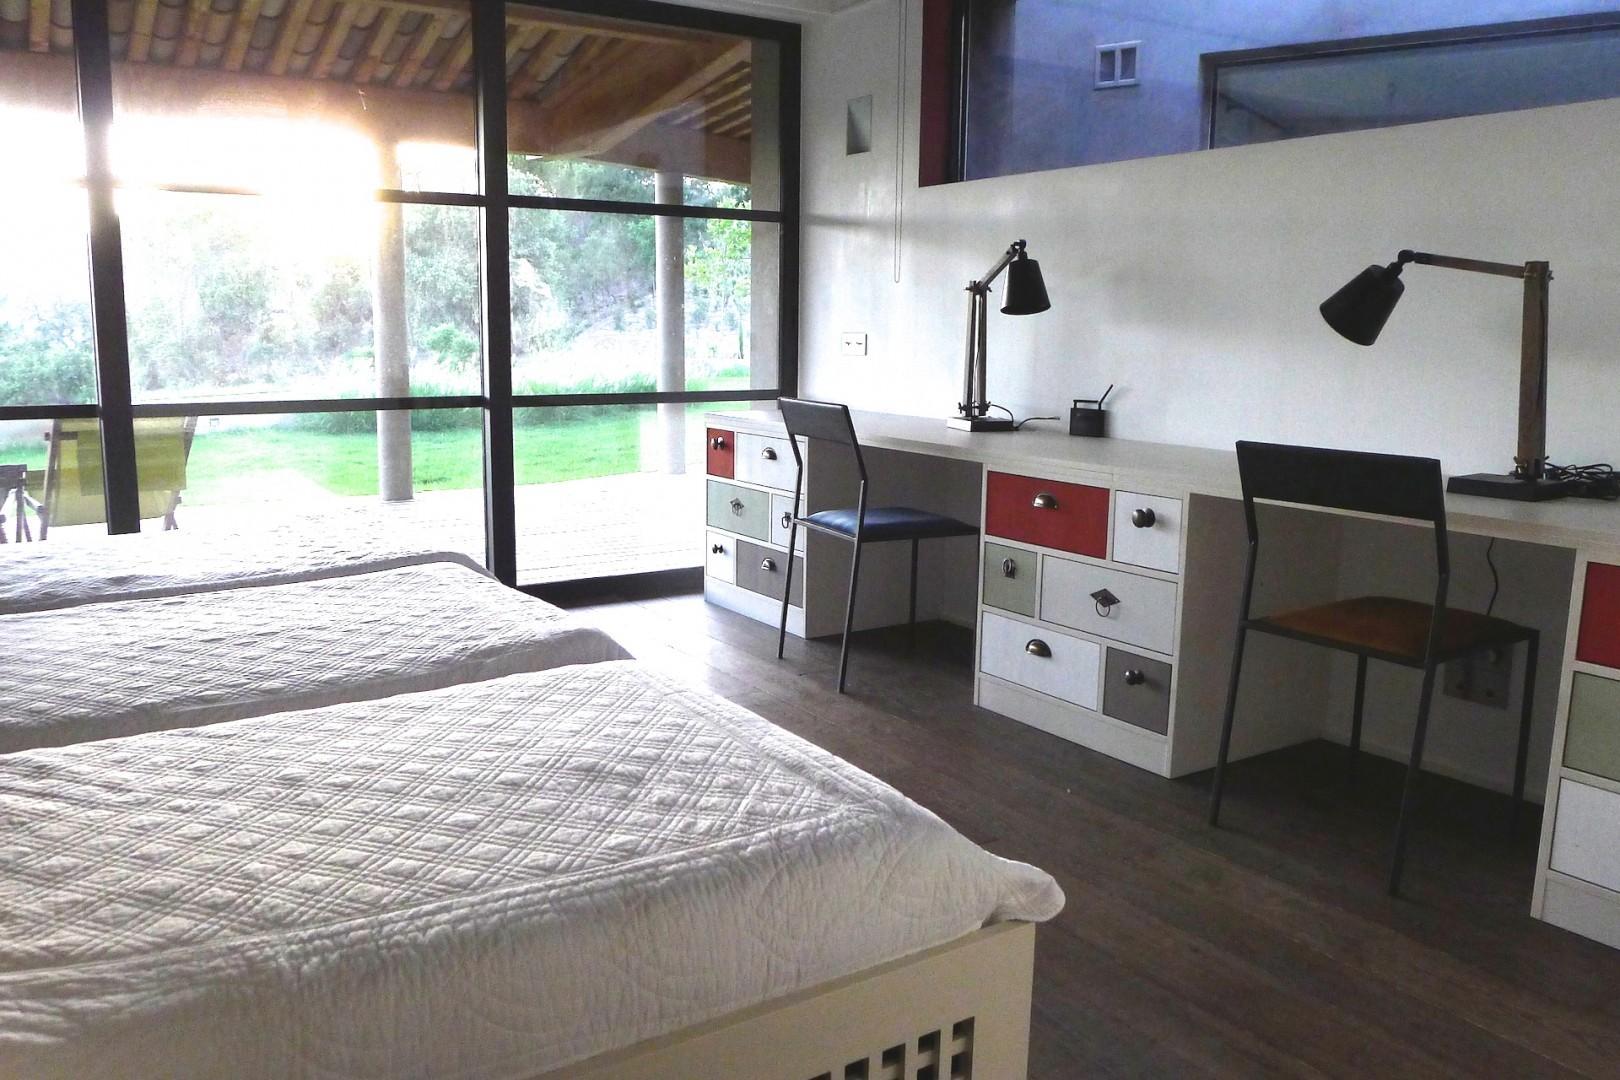 Each bedroom feels like its own peaceful retreat